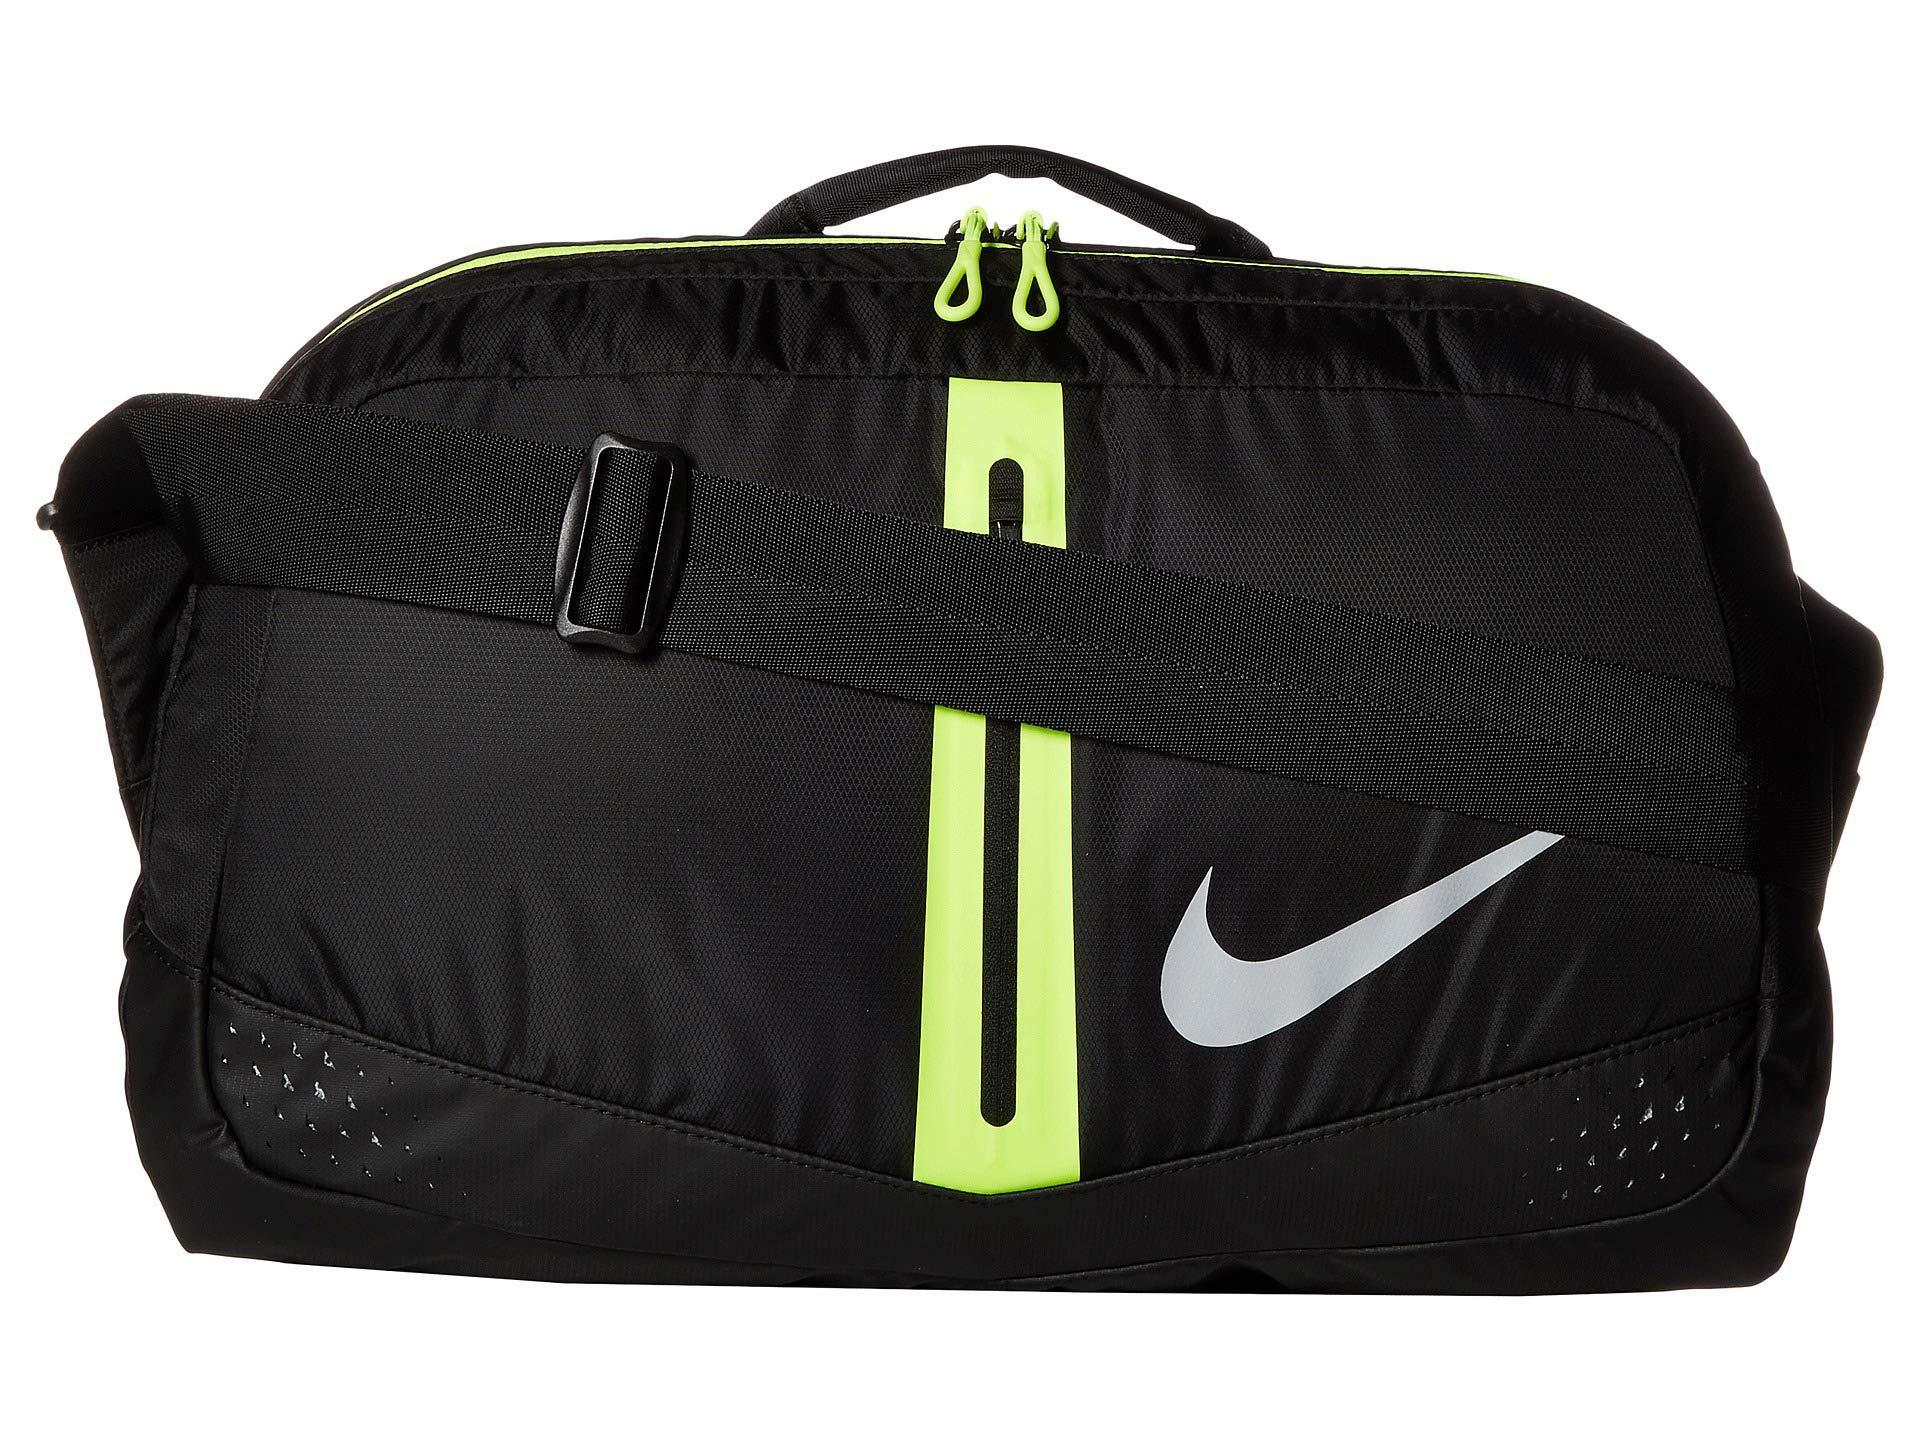 46723ae42a Lyst - Nike Run Duffel Bag 34l (black volt silver) Duffel Bags in ...